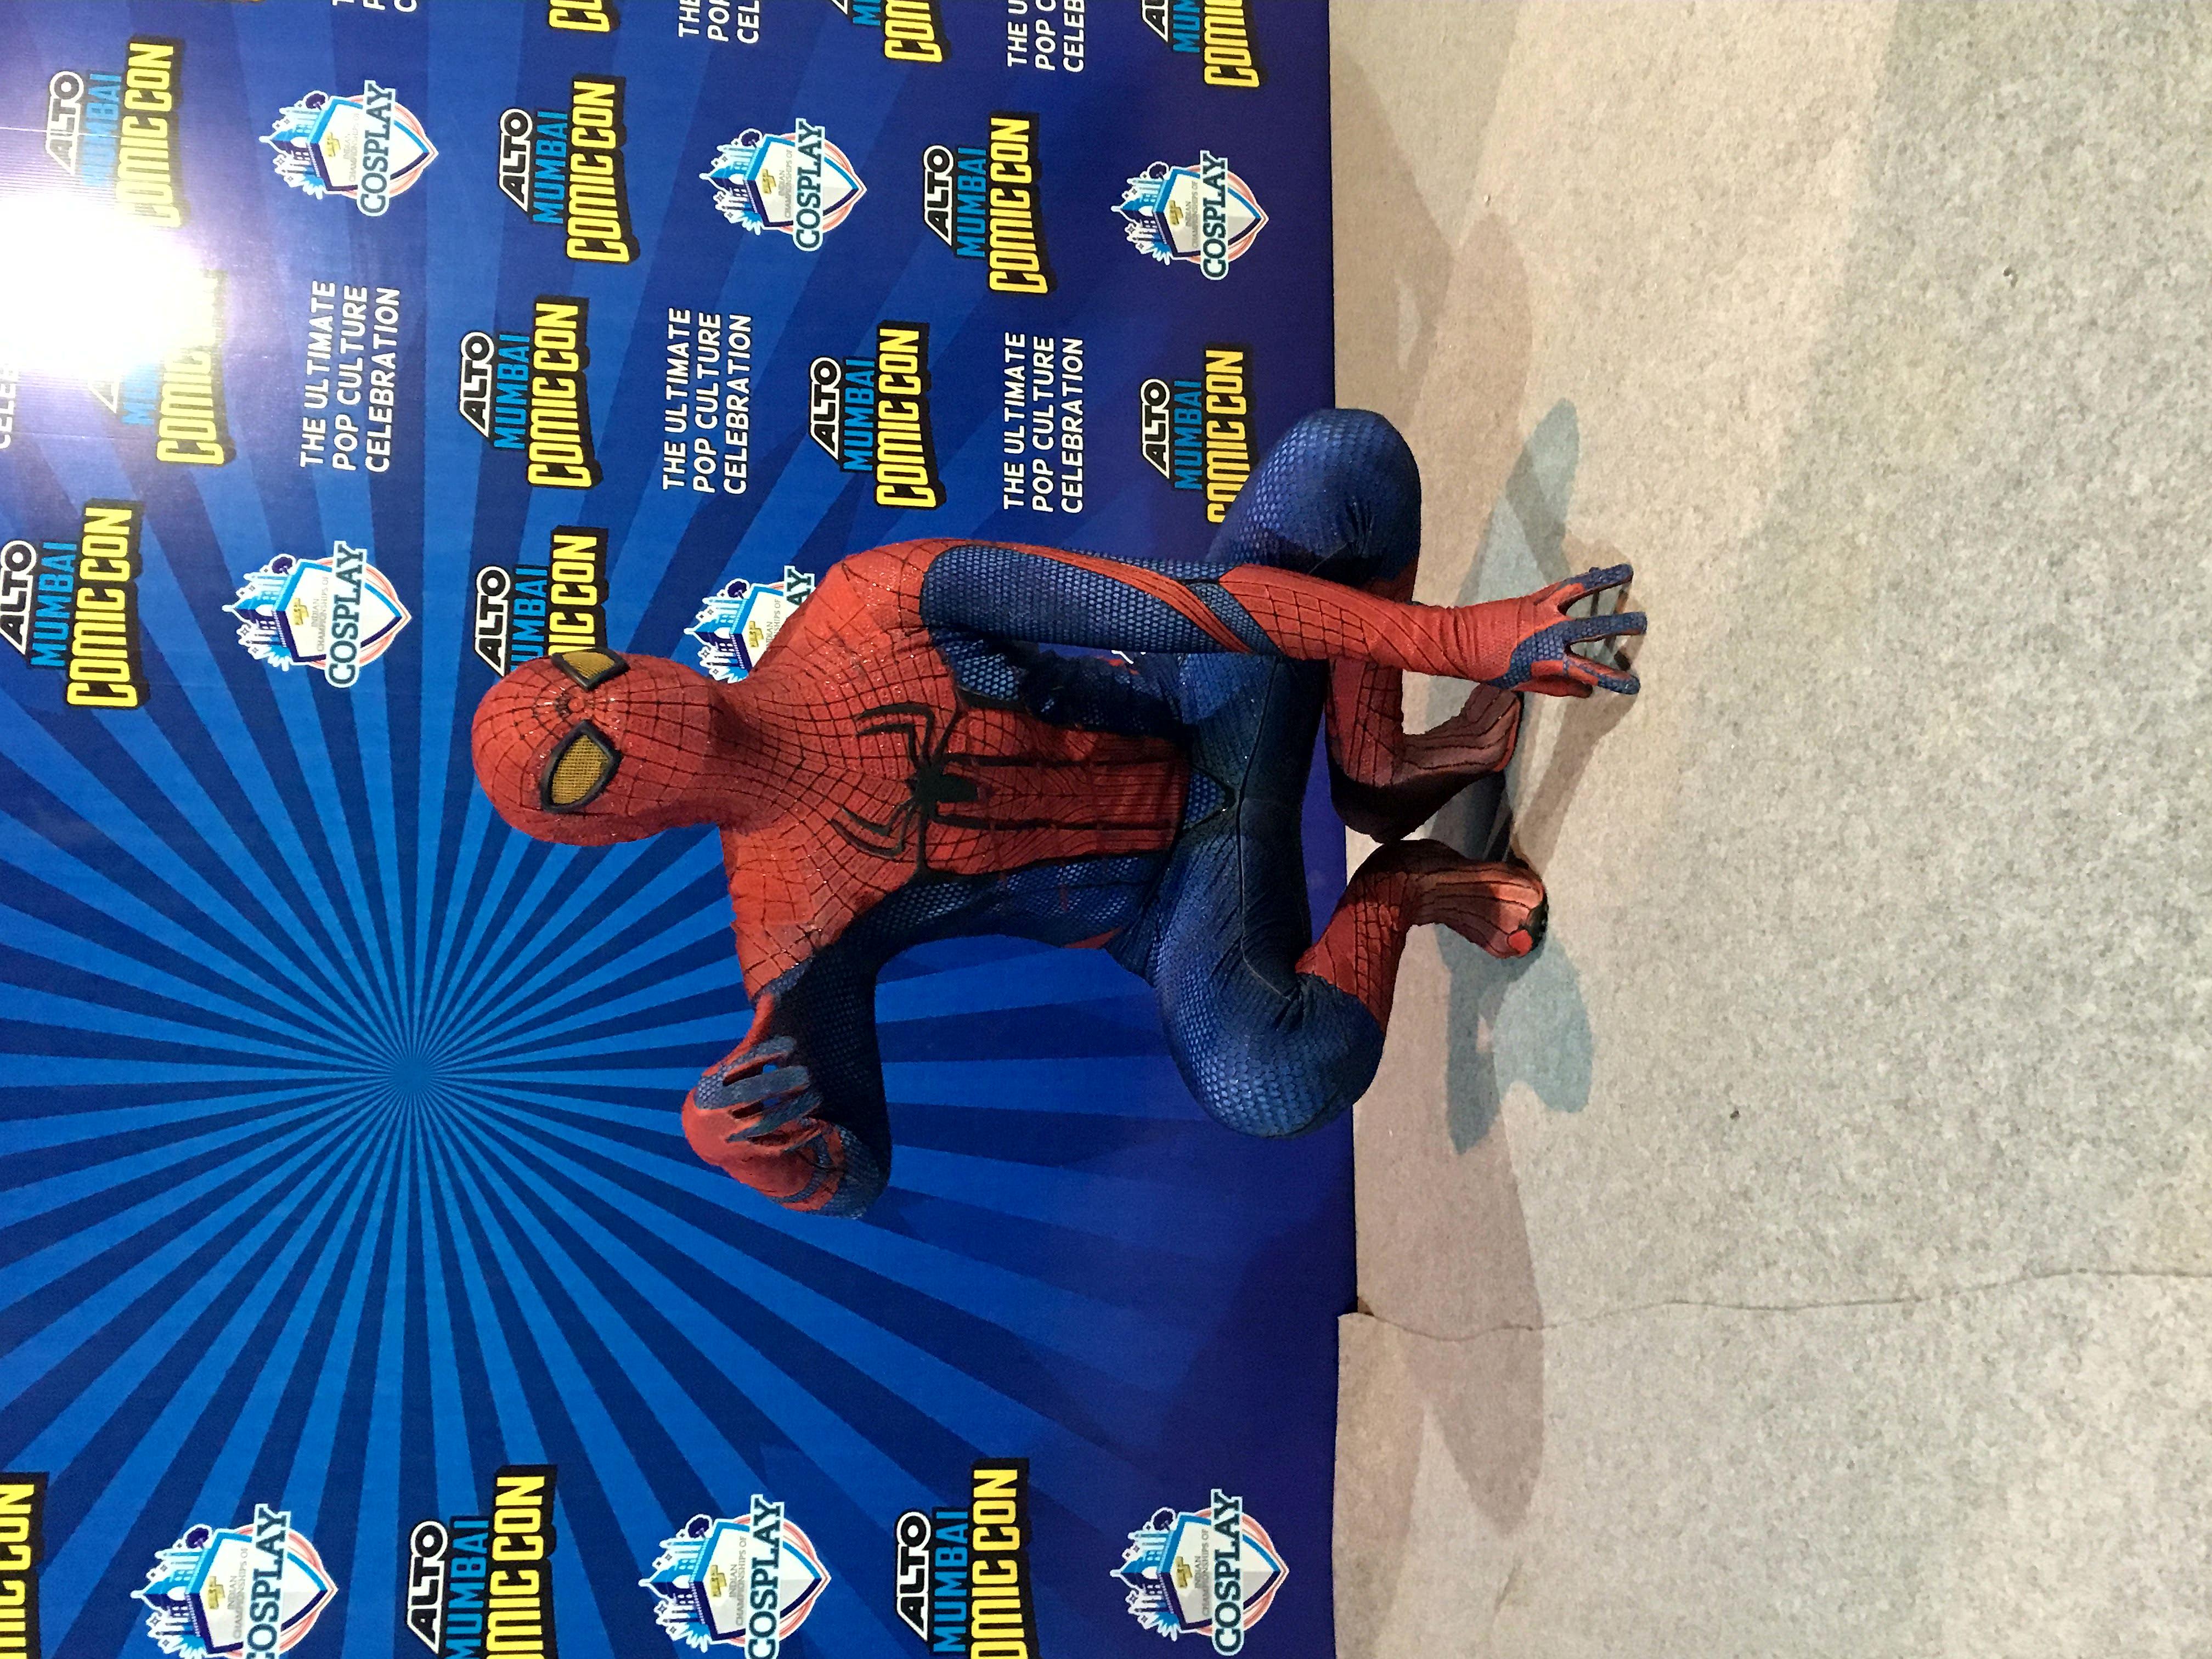 Gaurav Thakur's Spiderman Cosplay